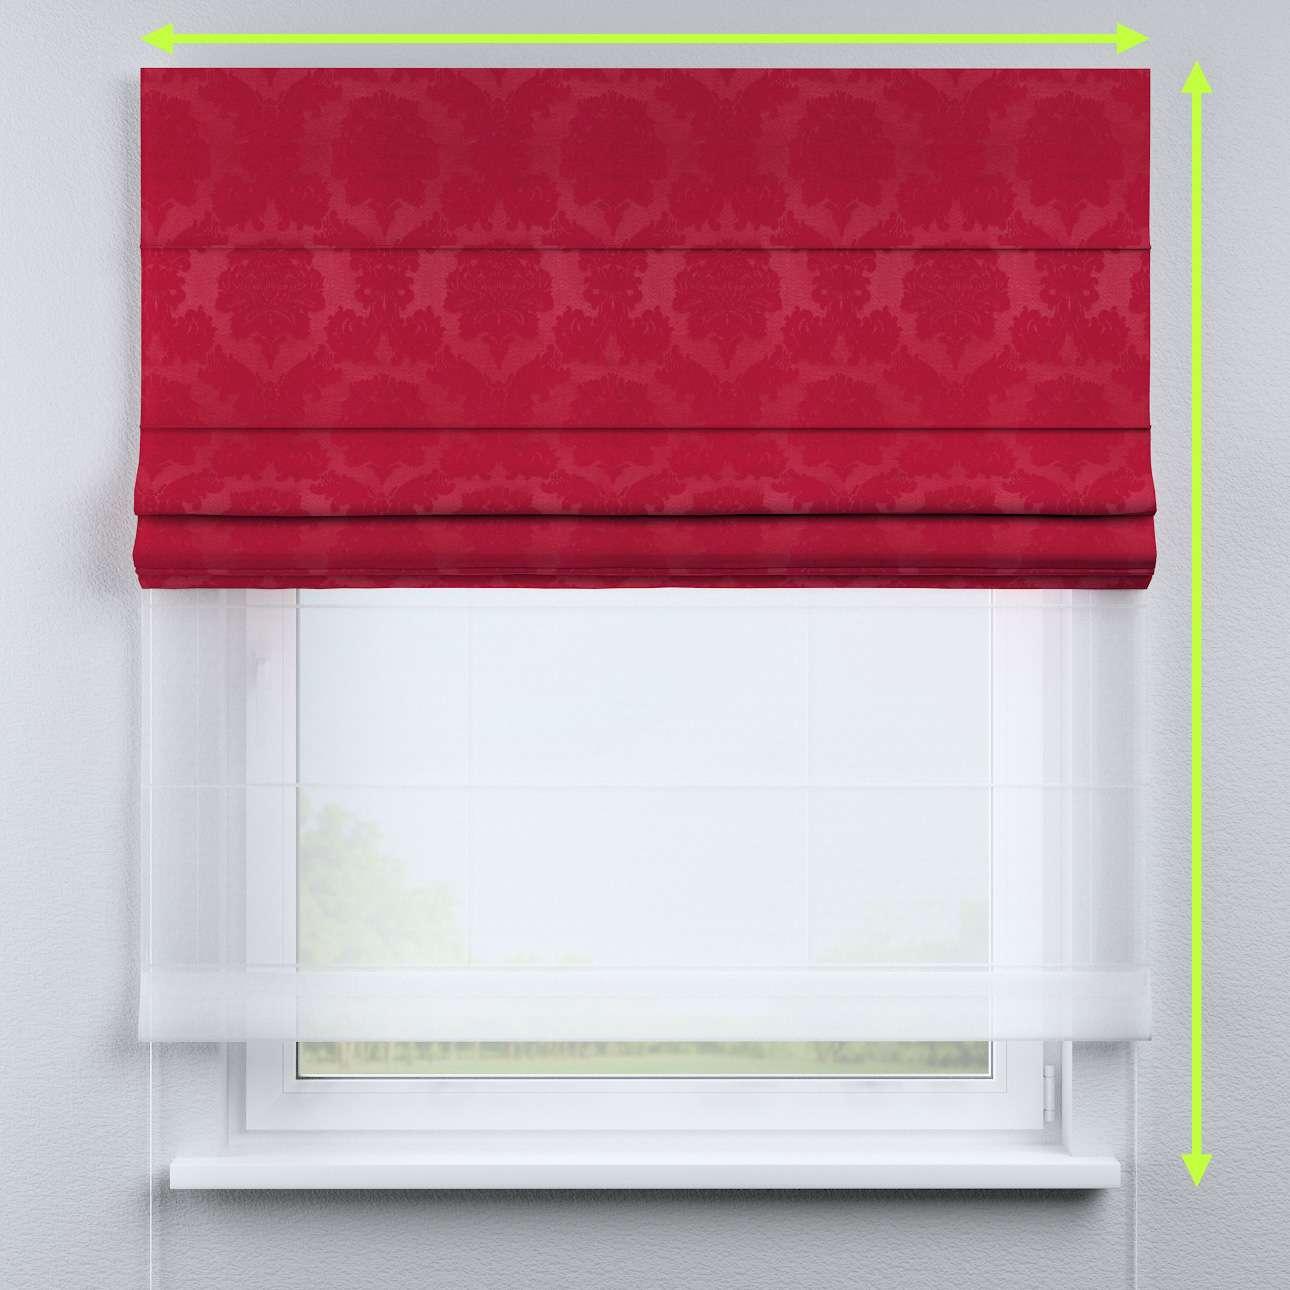 Rímska DUO roleta II V kolekcii Damasco, tkanina: 613-13